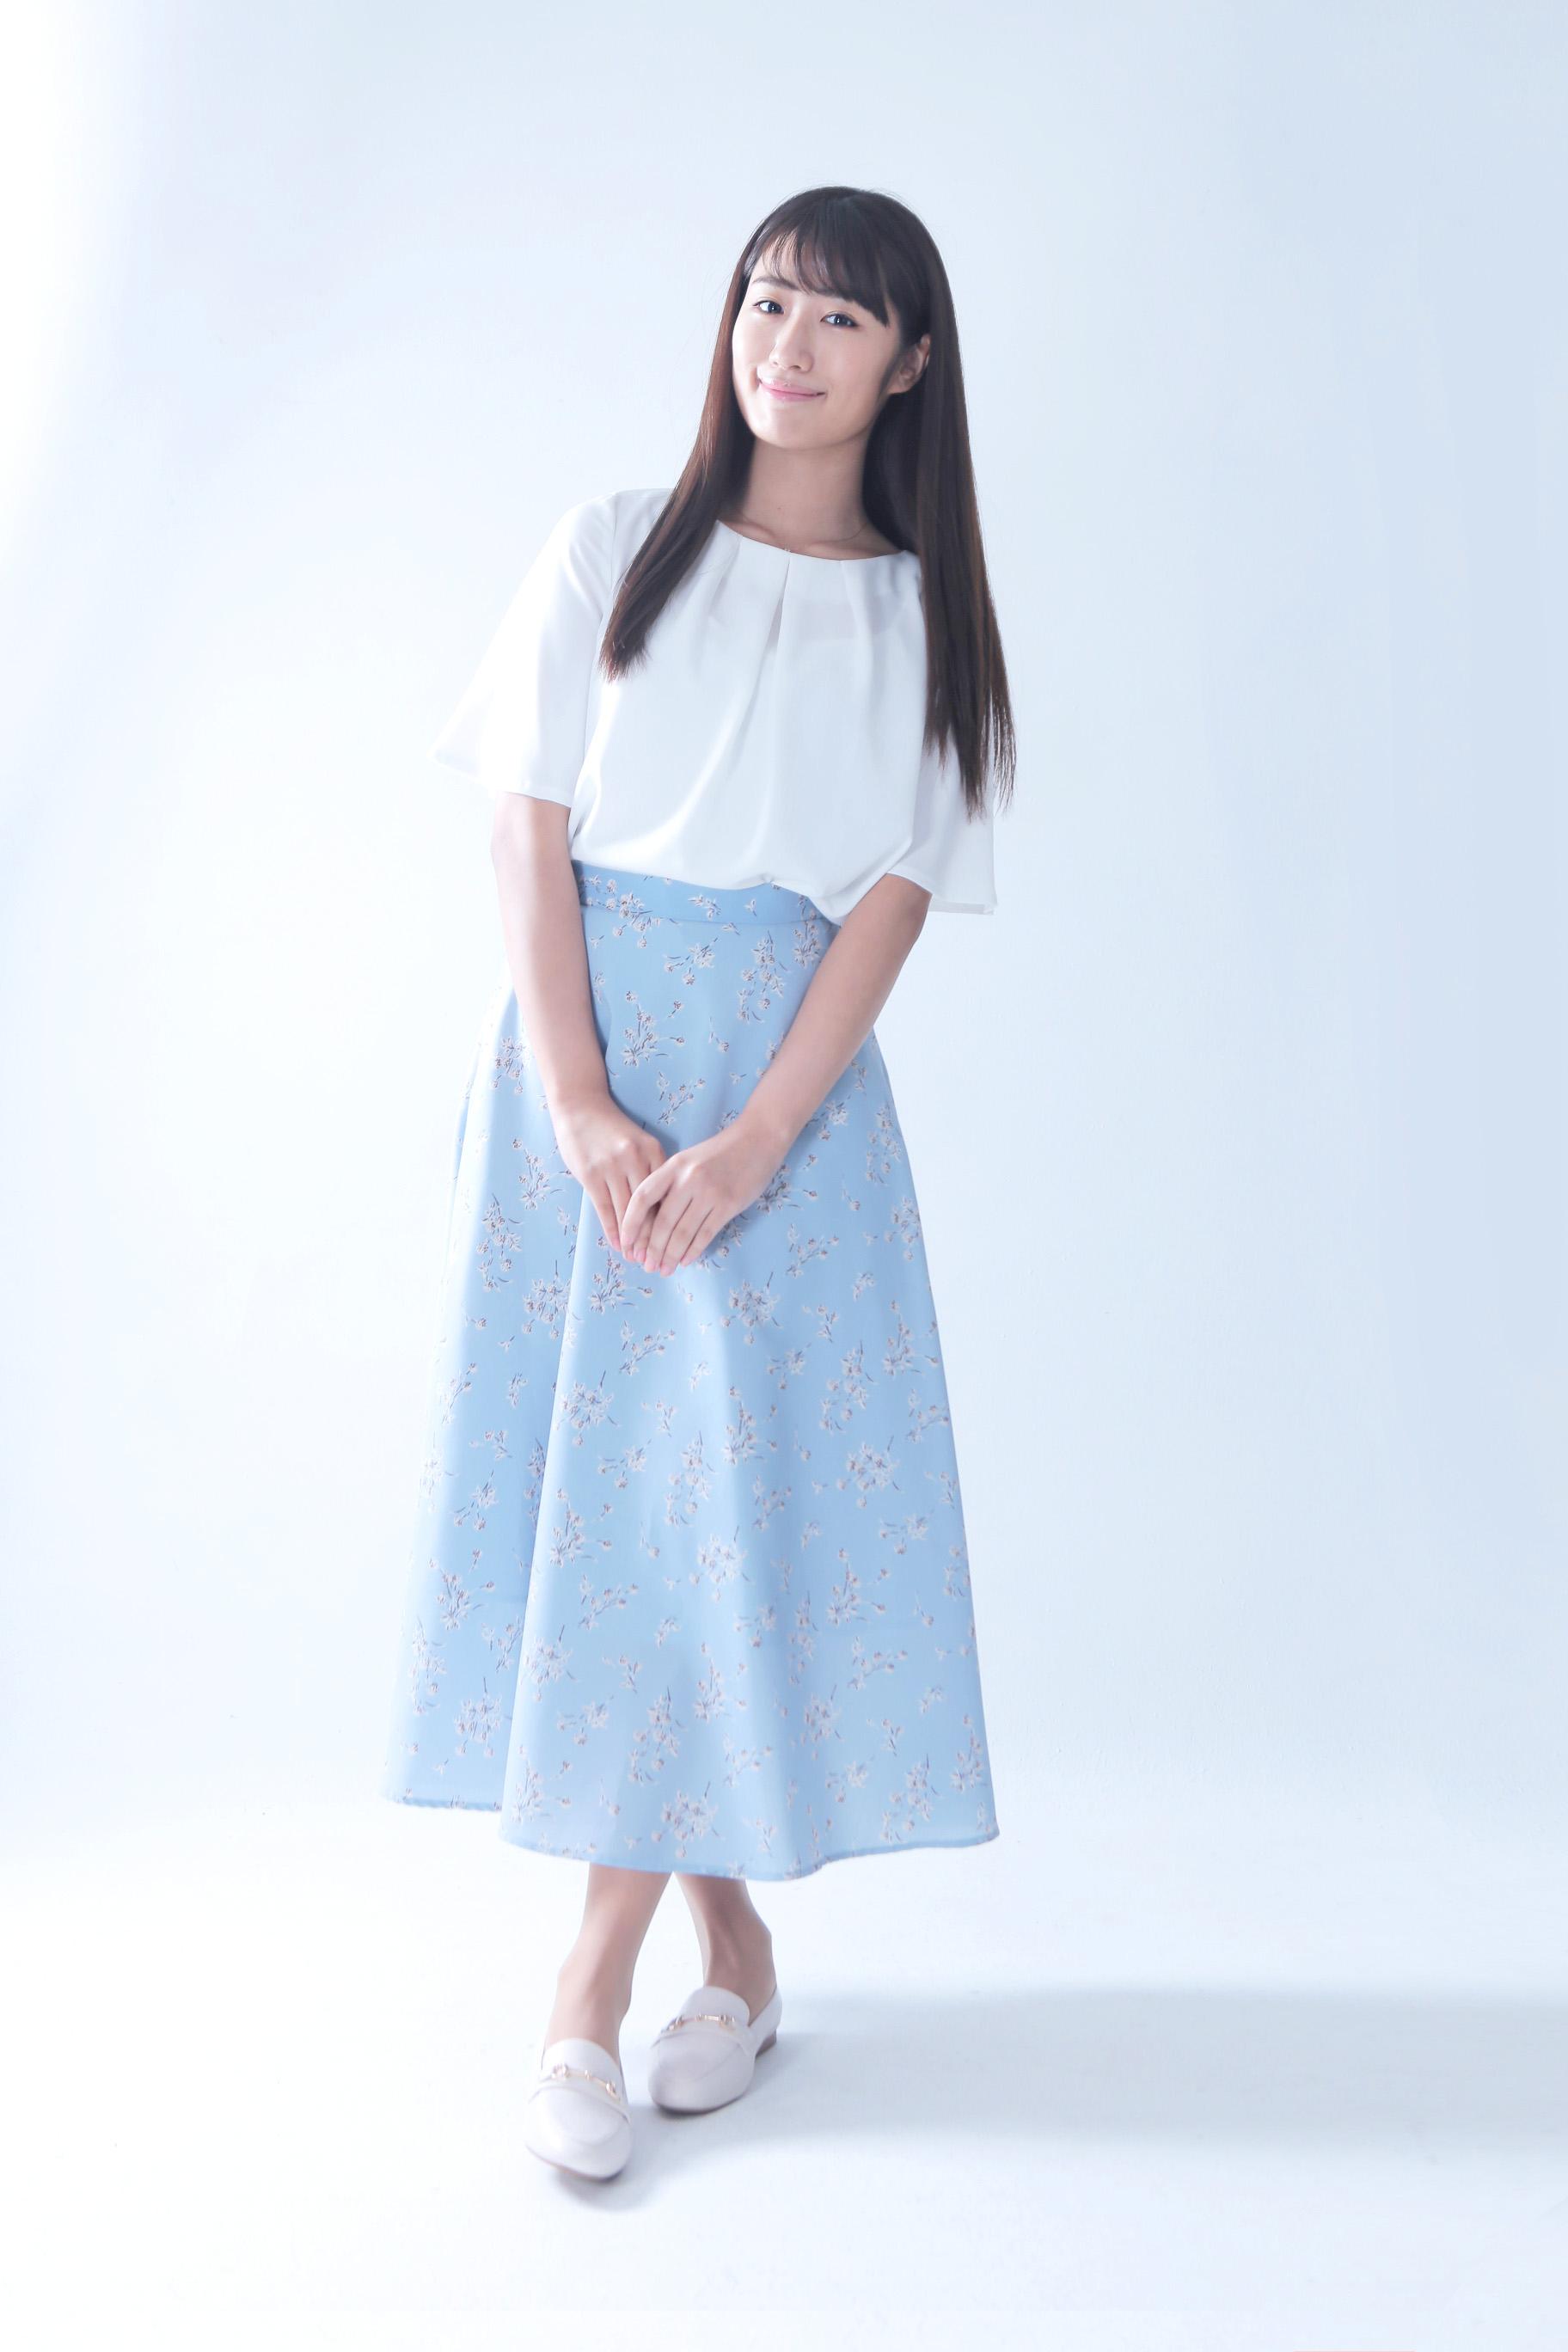 actjp_a_026_nana_fujita2_04